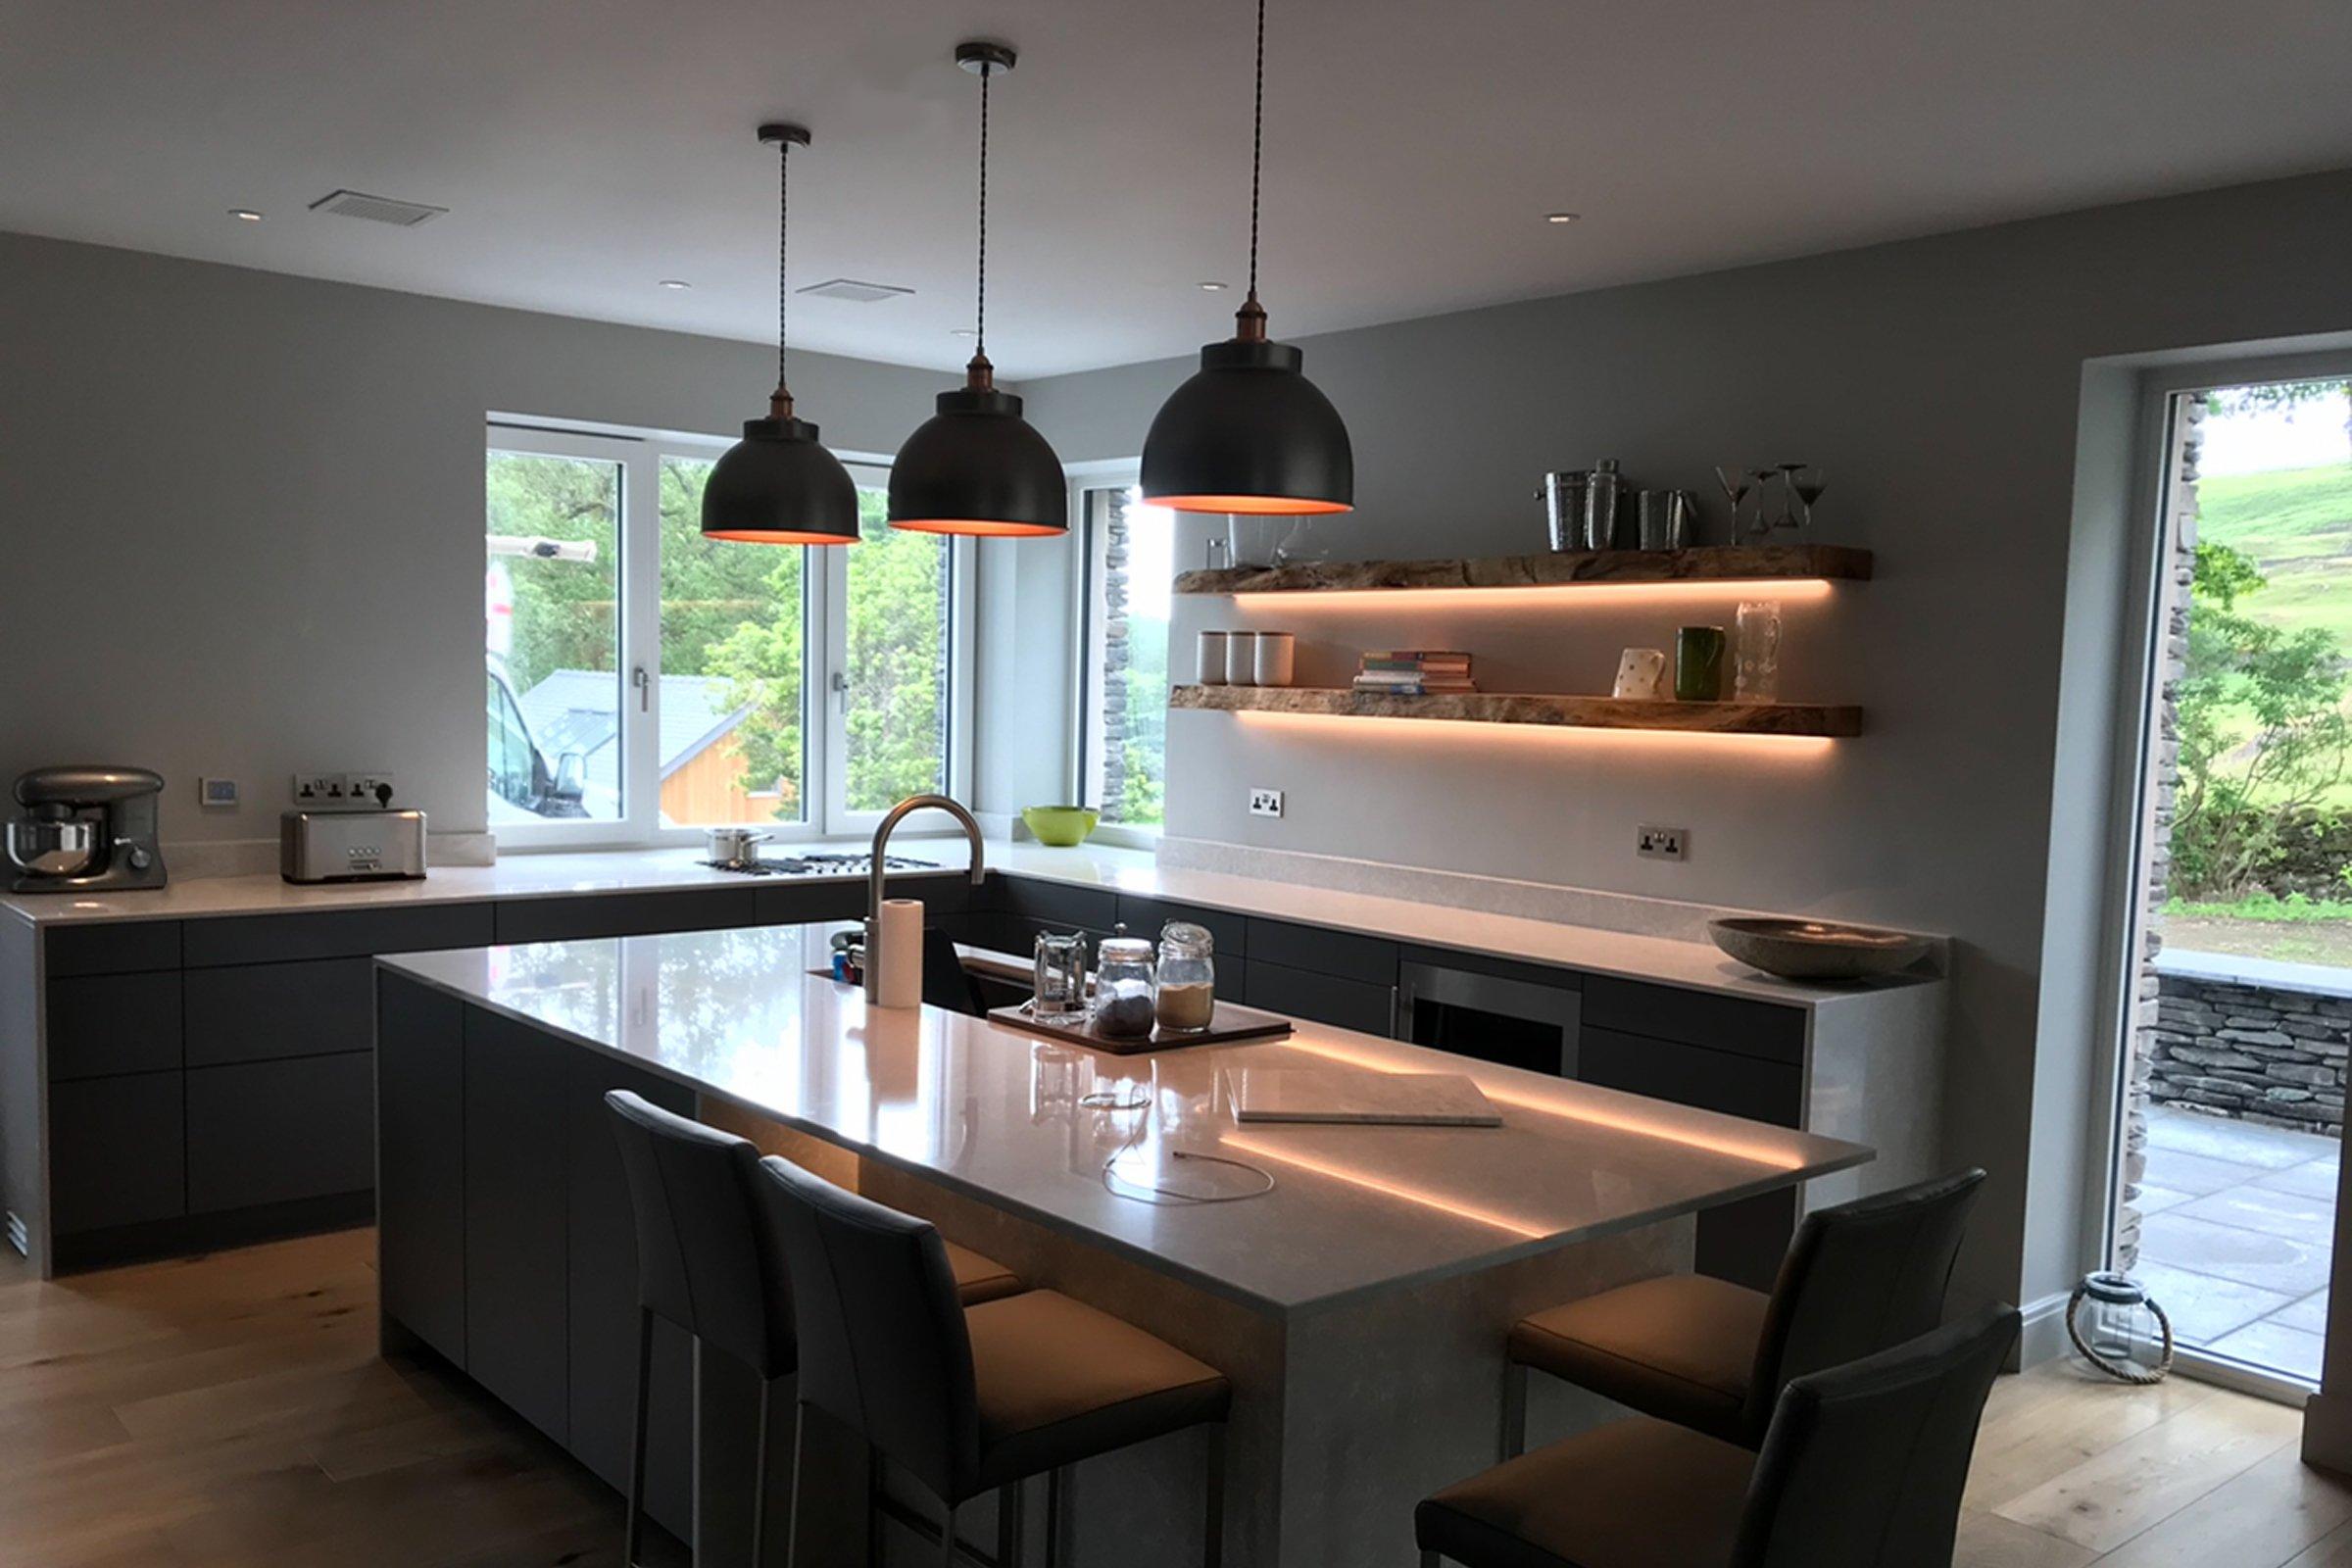 Luxury kitchen with Savant audio system